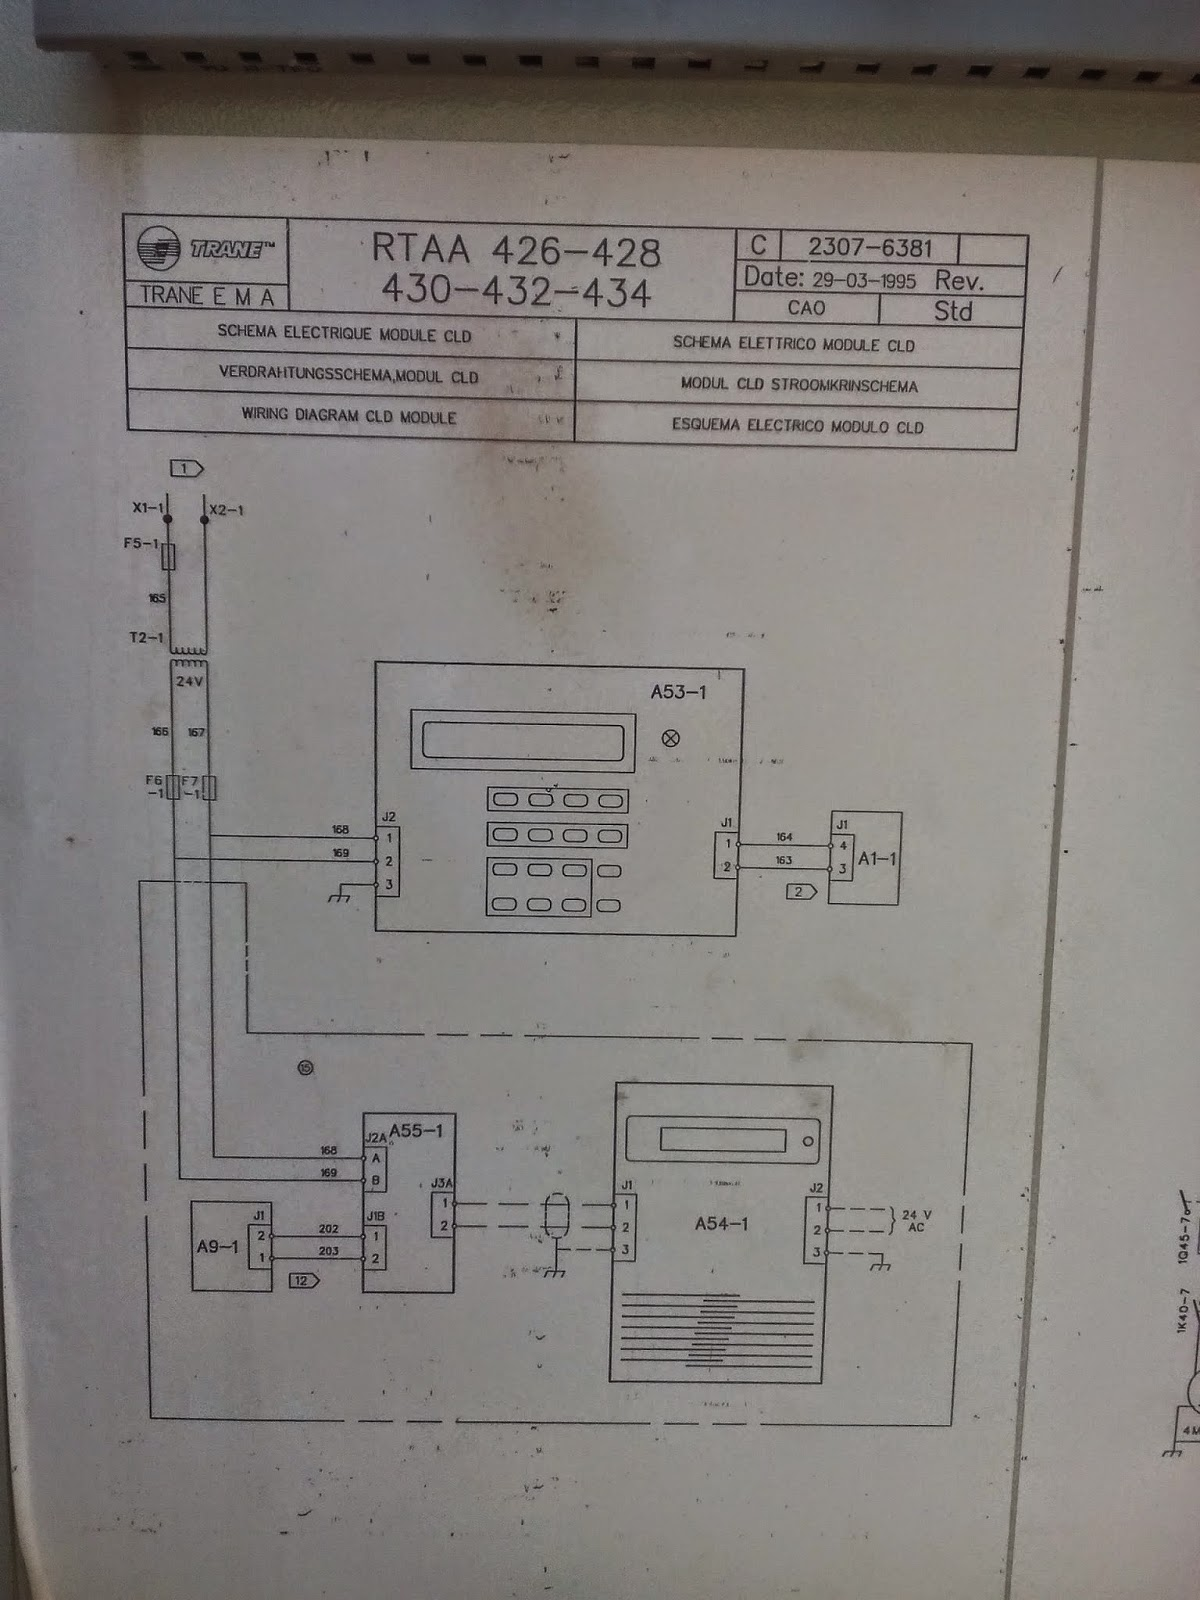 HVAC, CHILLERS, HEATPUMP: Trane chiller air cooled control wiring diagram RTAA Series